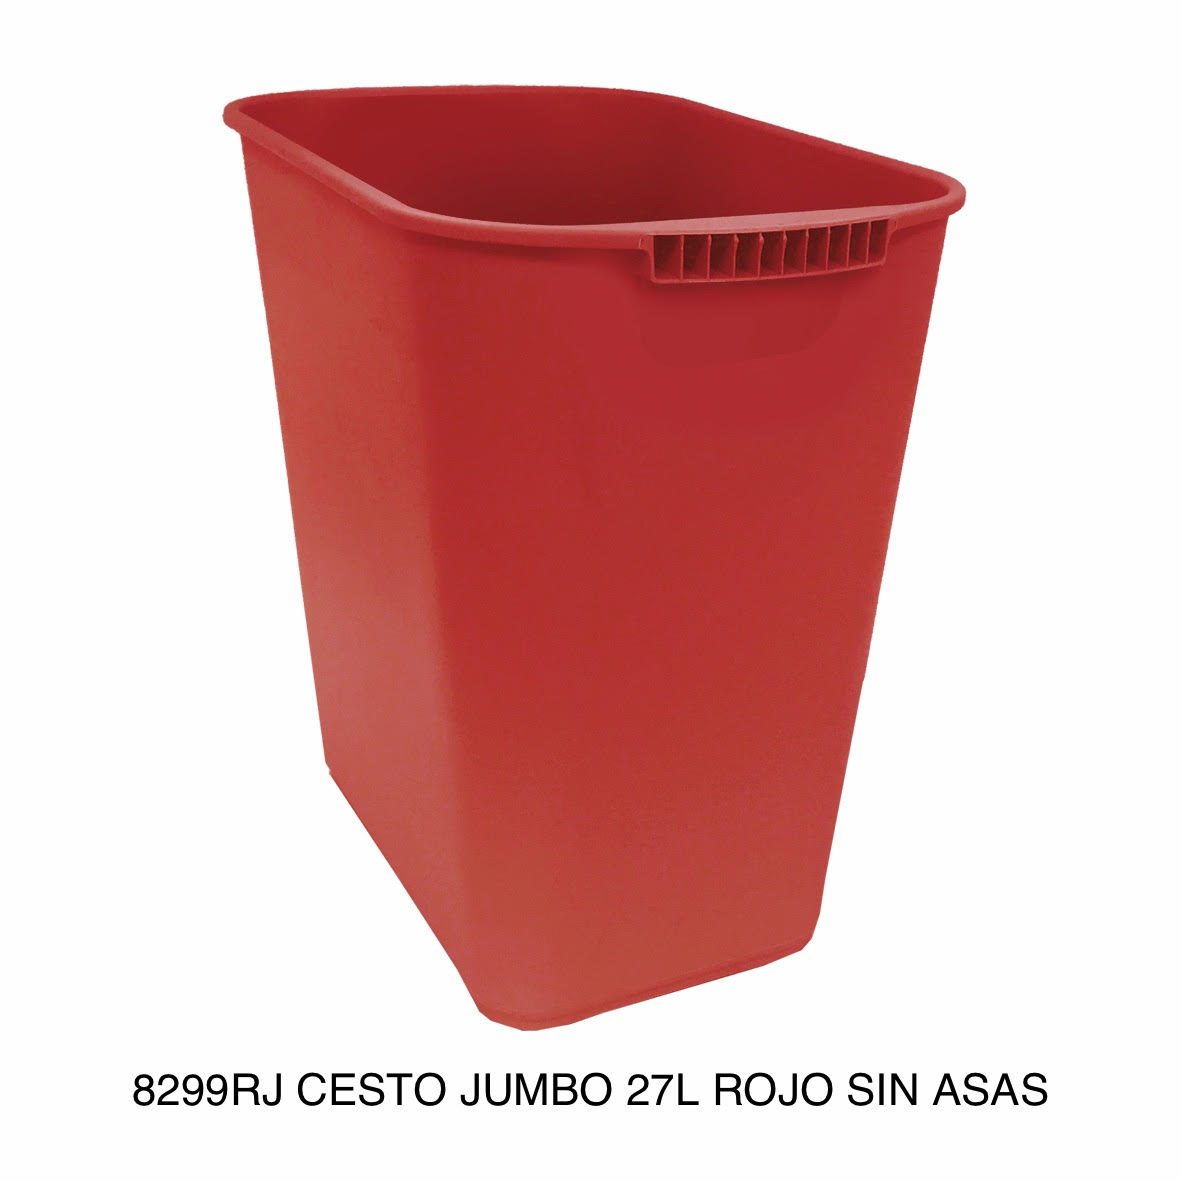 Bote de basura jumbo modelo 8299RJ color rojo sin asas de Sablón